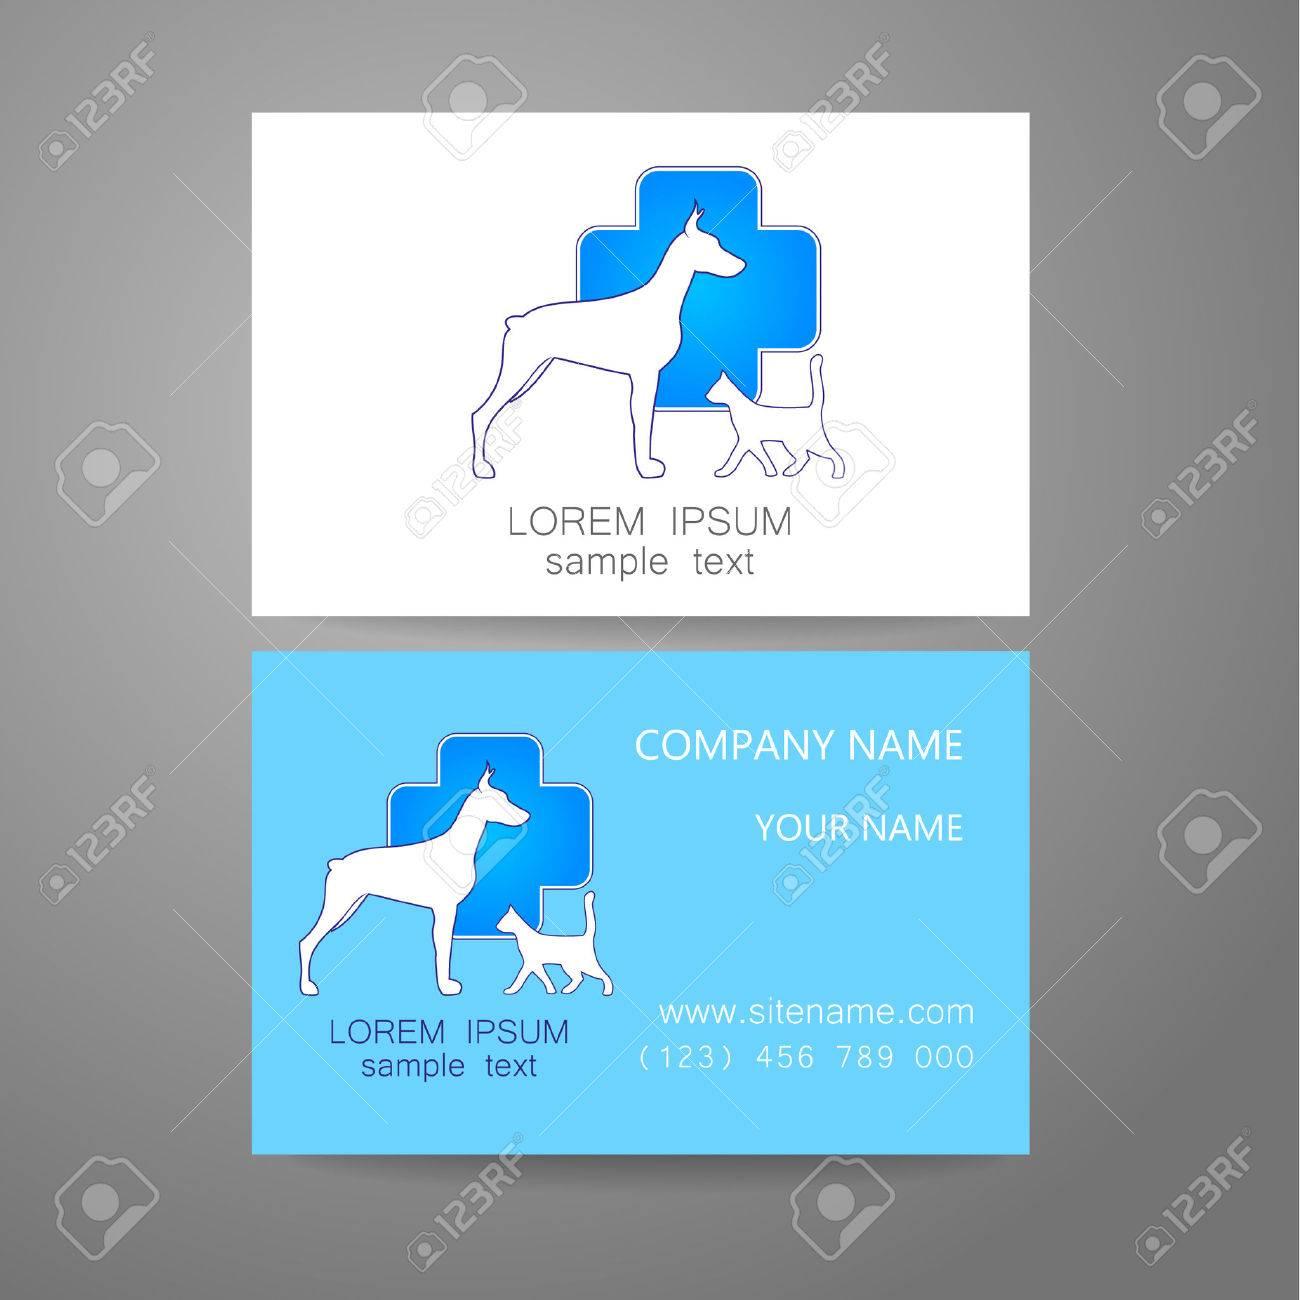 Veterinary - Template Logo. The Idea Of The Logo For The Veterinary ...